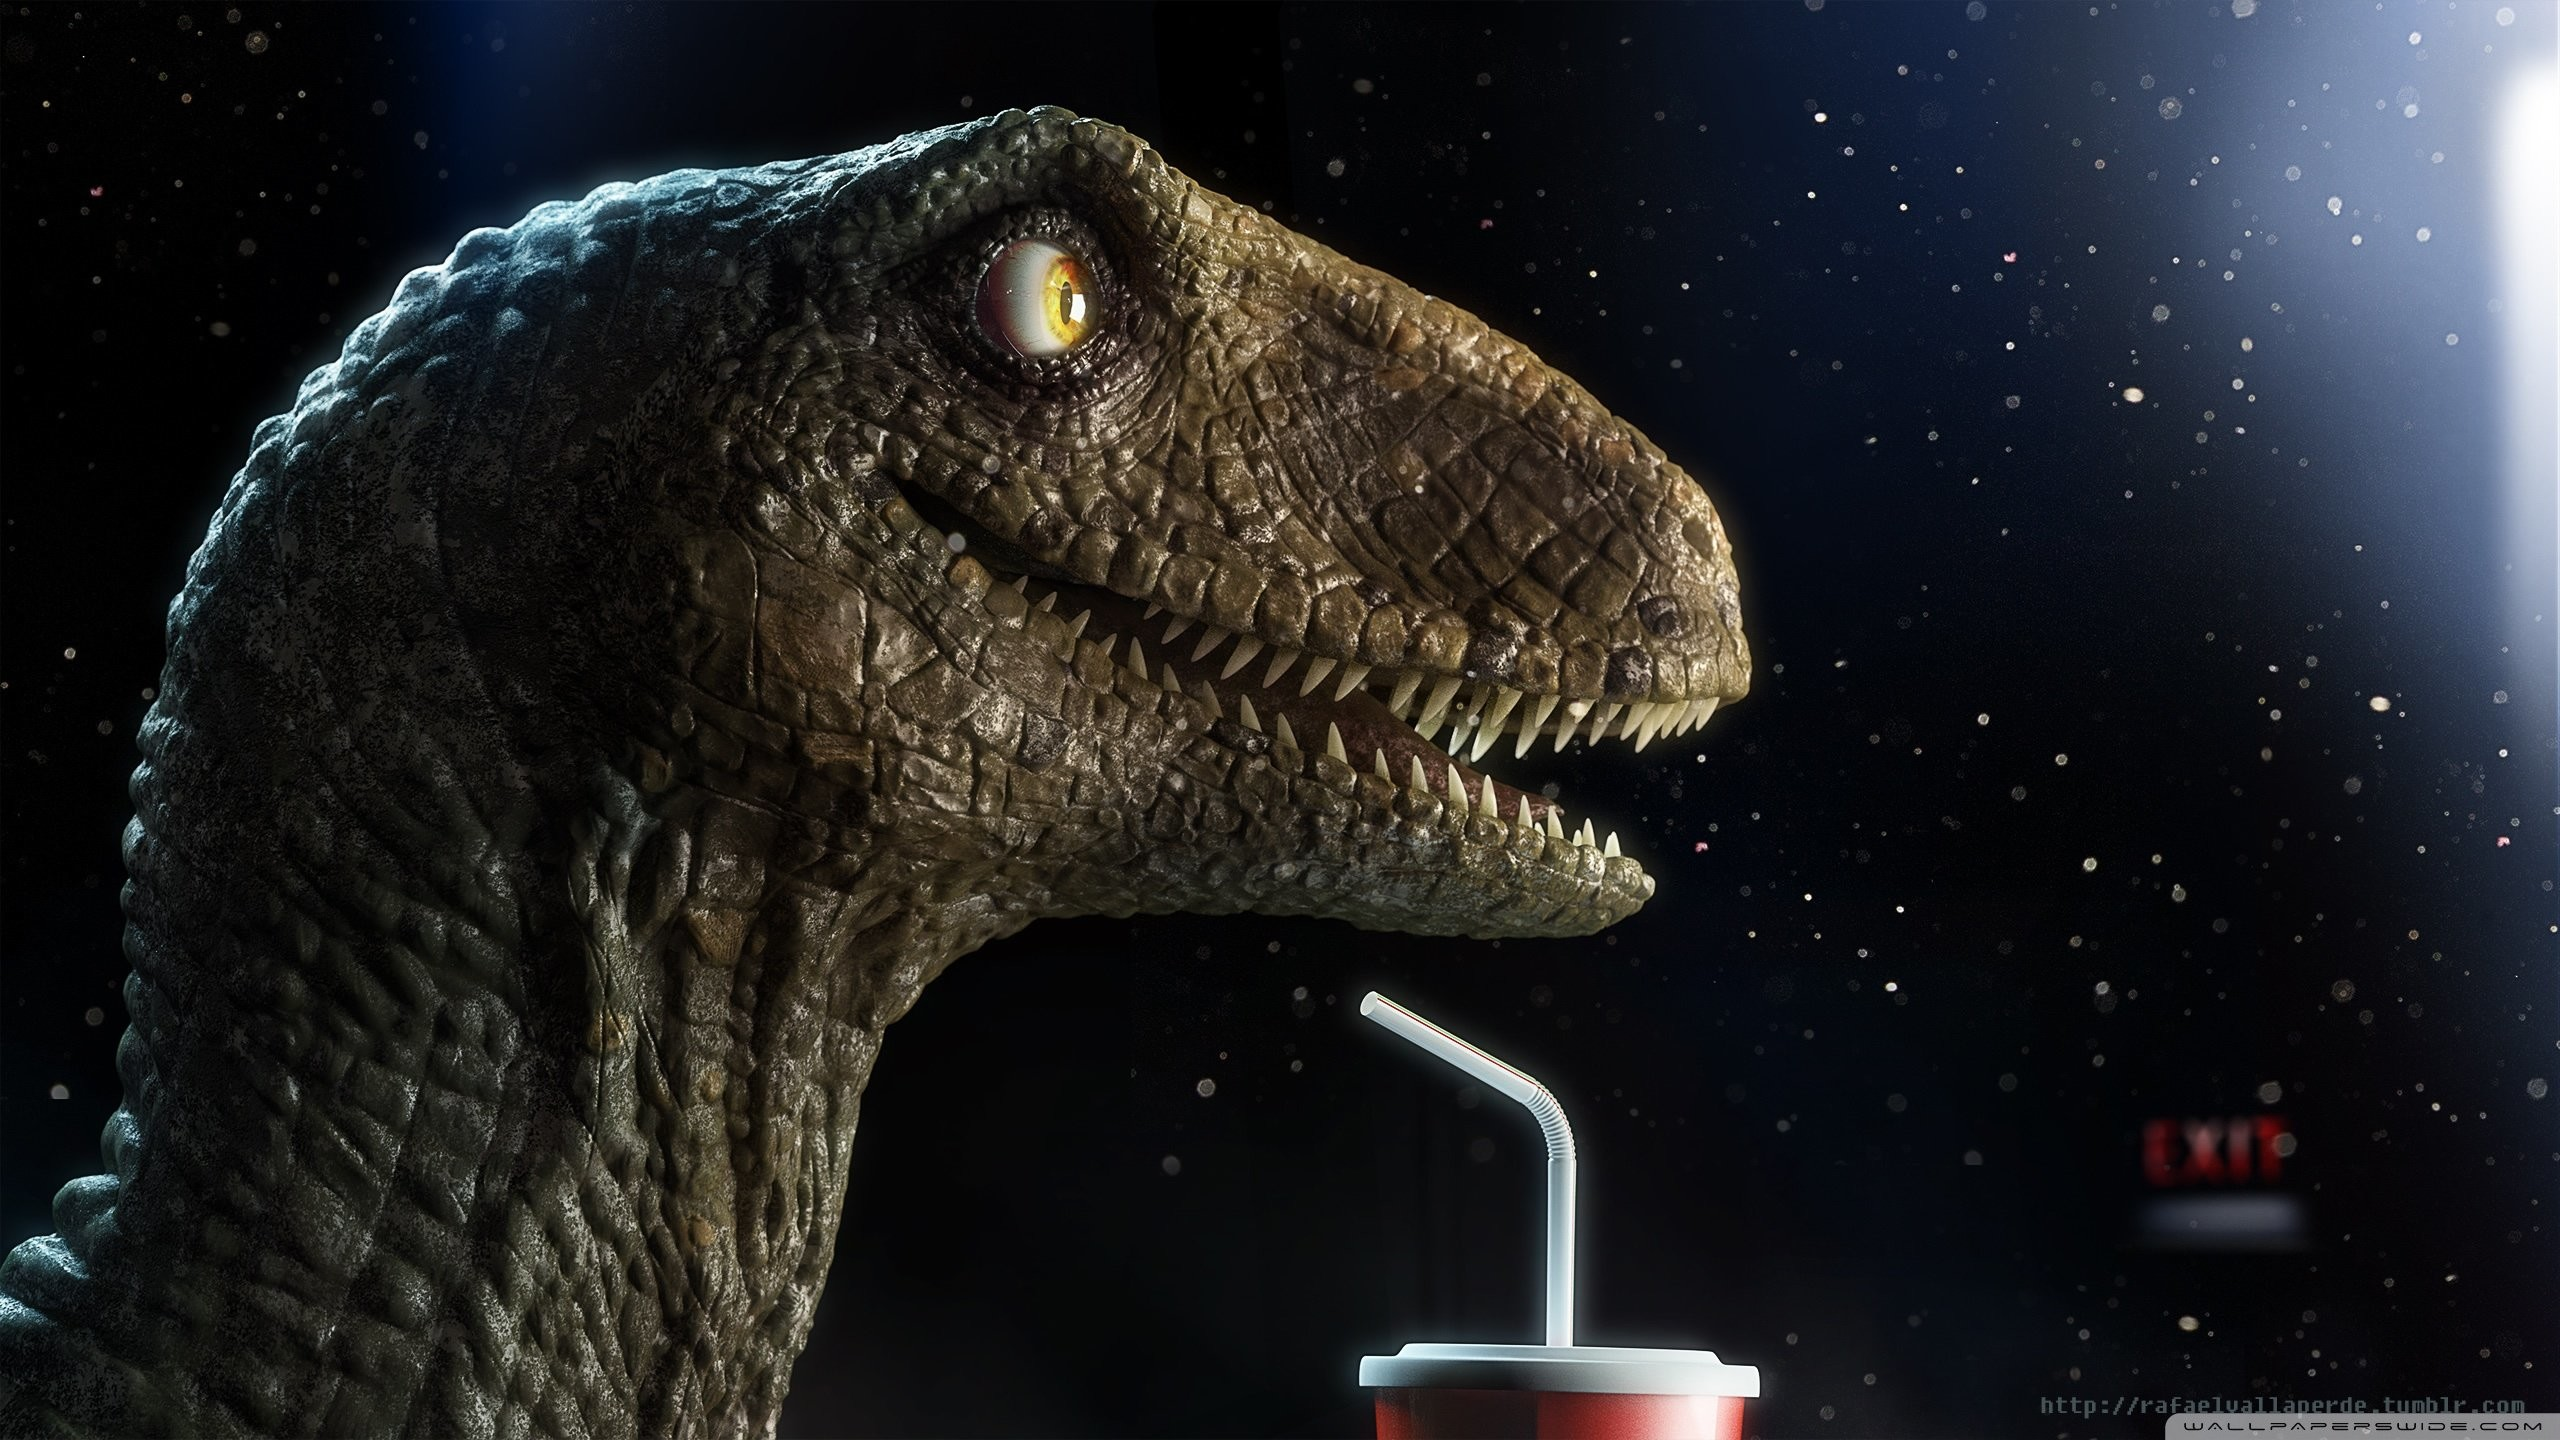 Best 25+ Godzilla wallpaper ideas on Pinterest | Godzilla, Godzilla godzilla  and Godzilla movie 1998